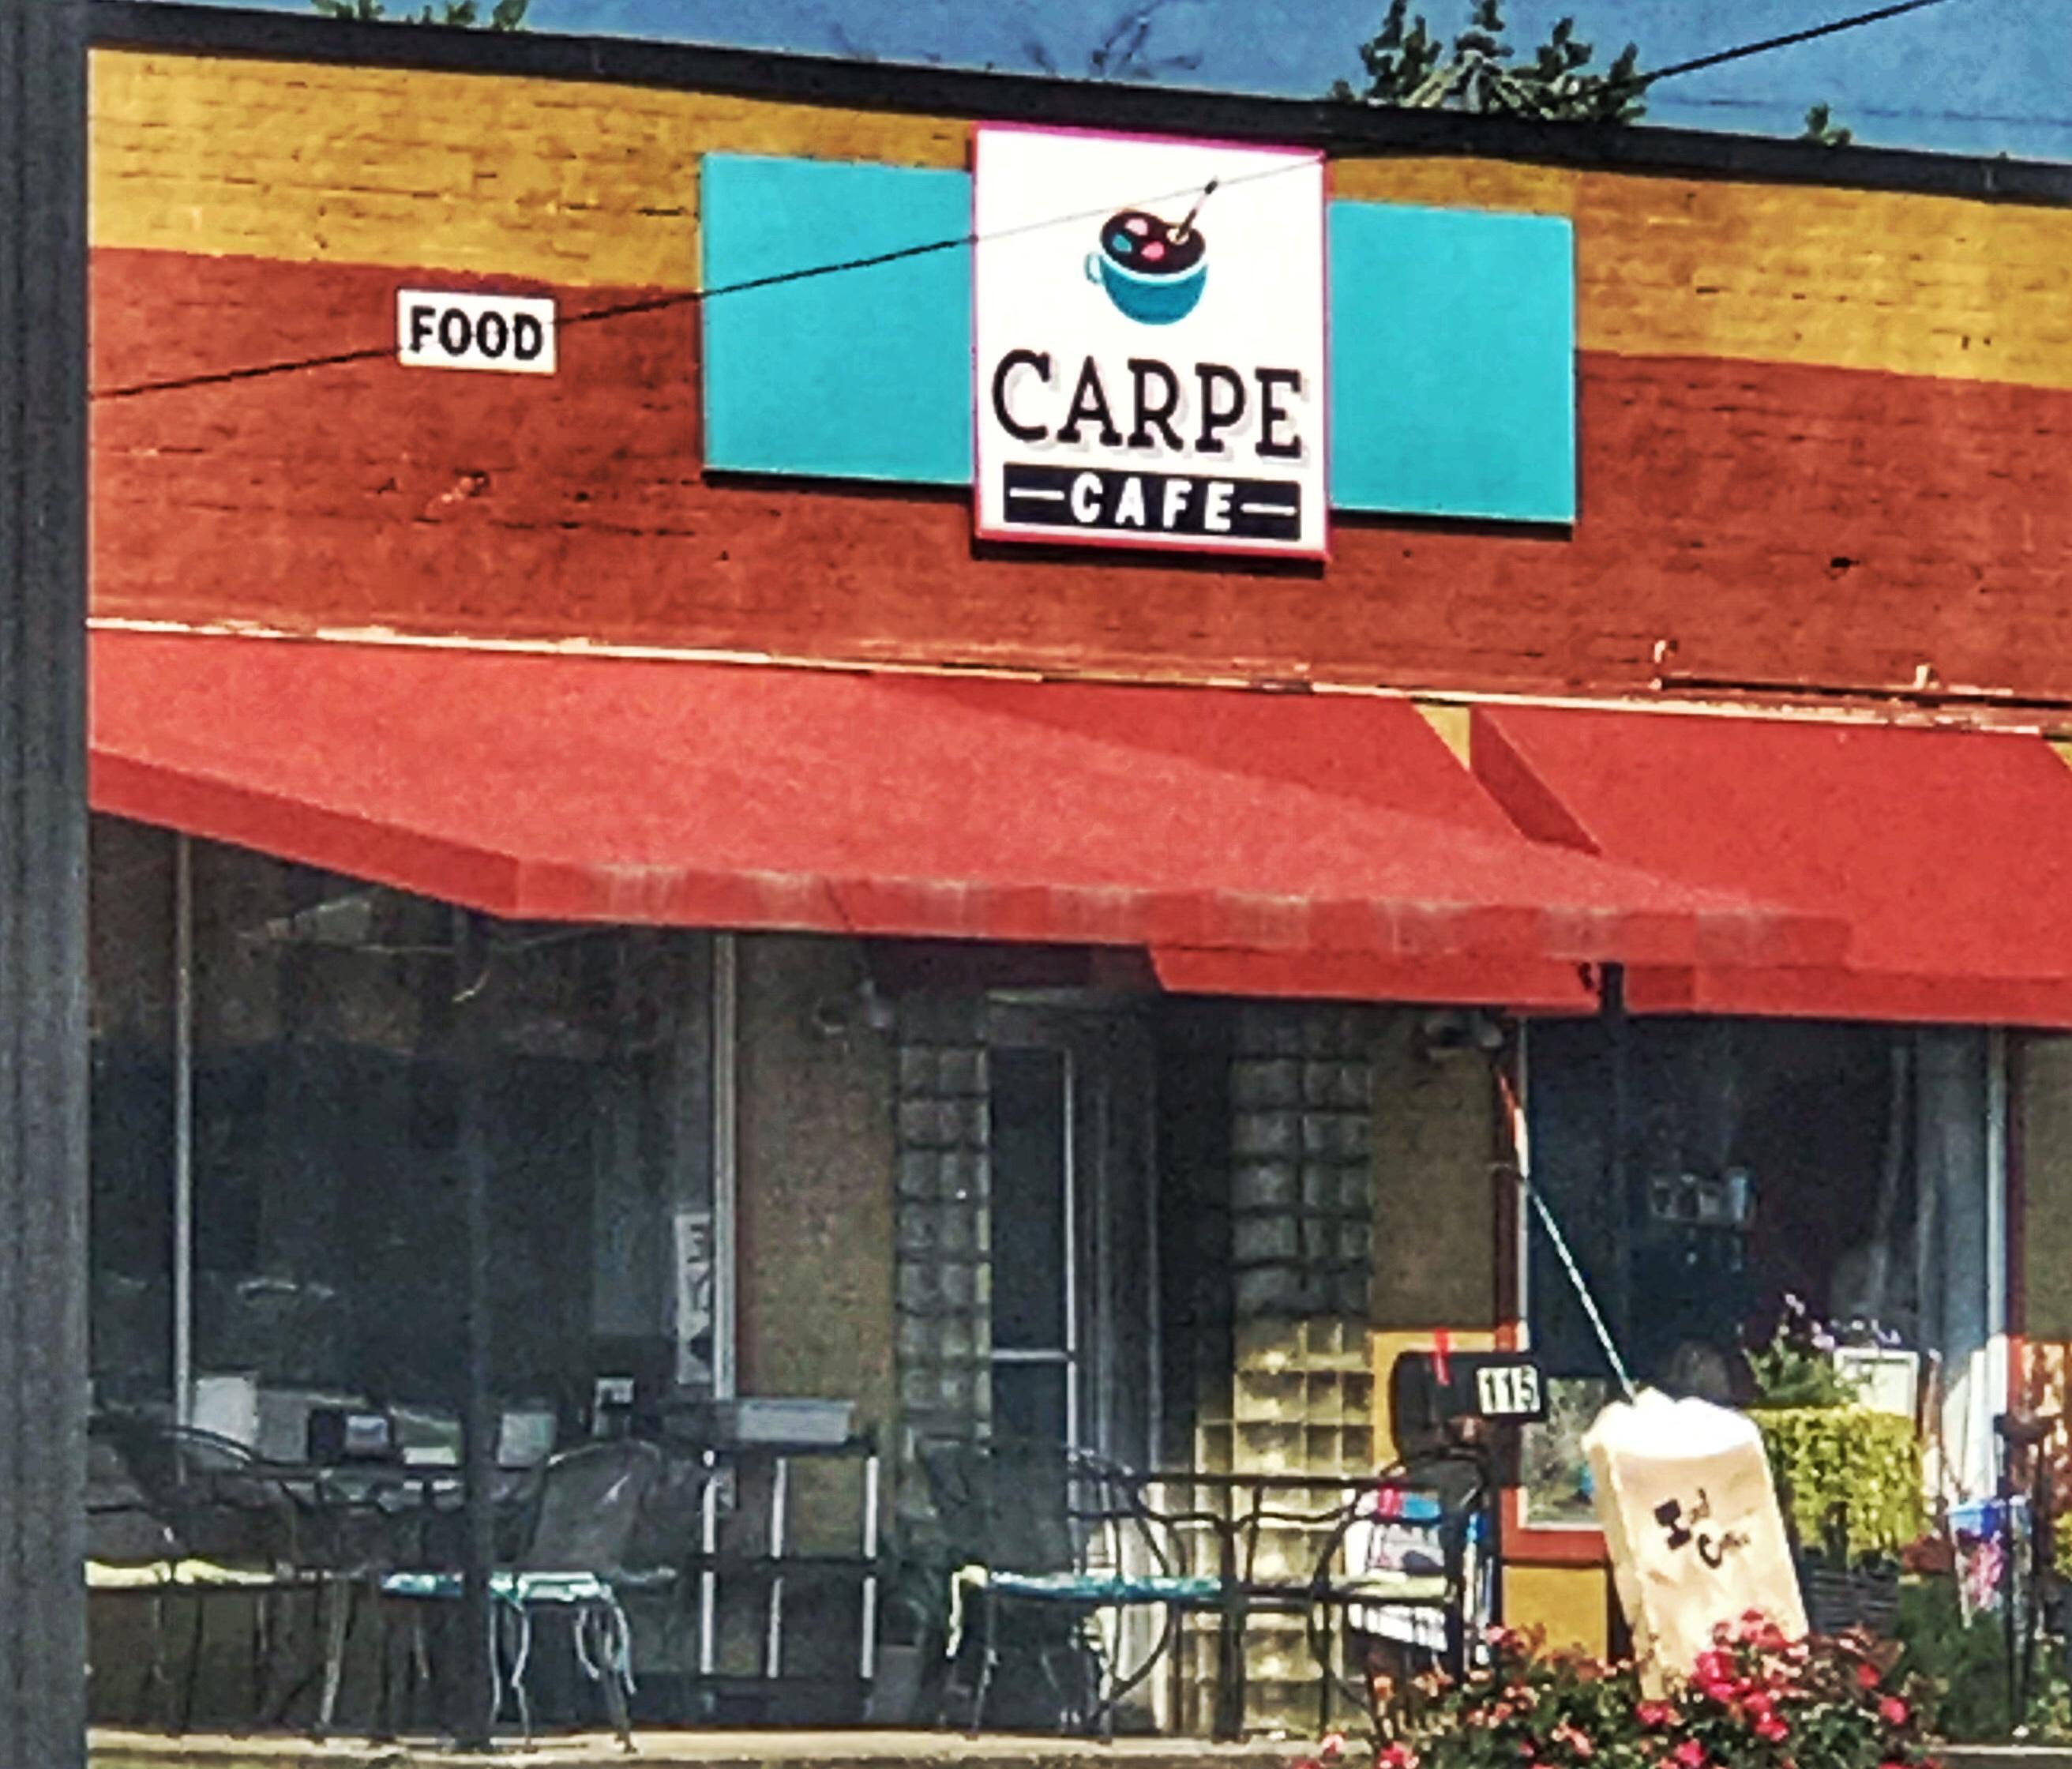 Carpe Cafe